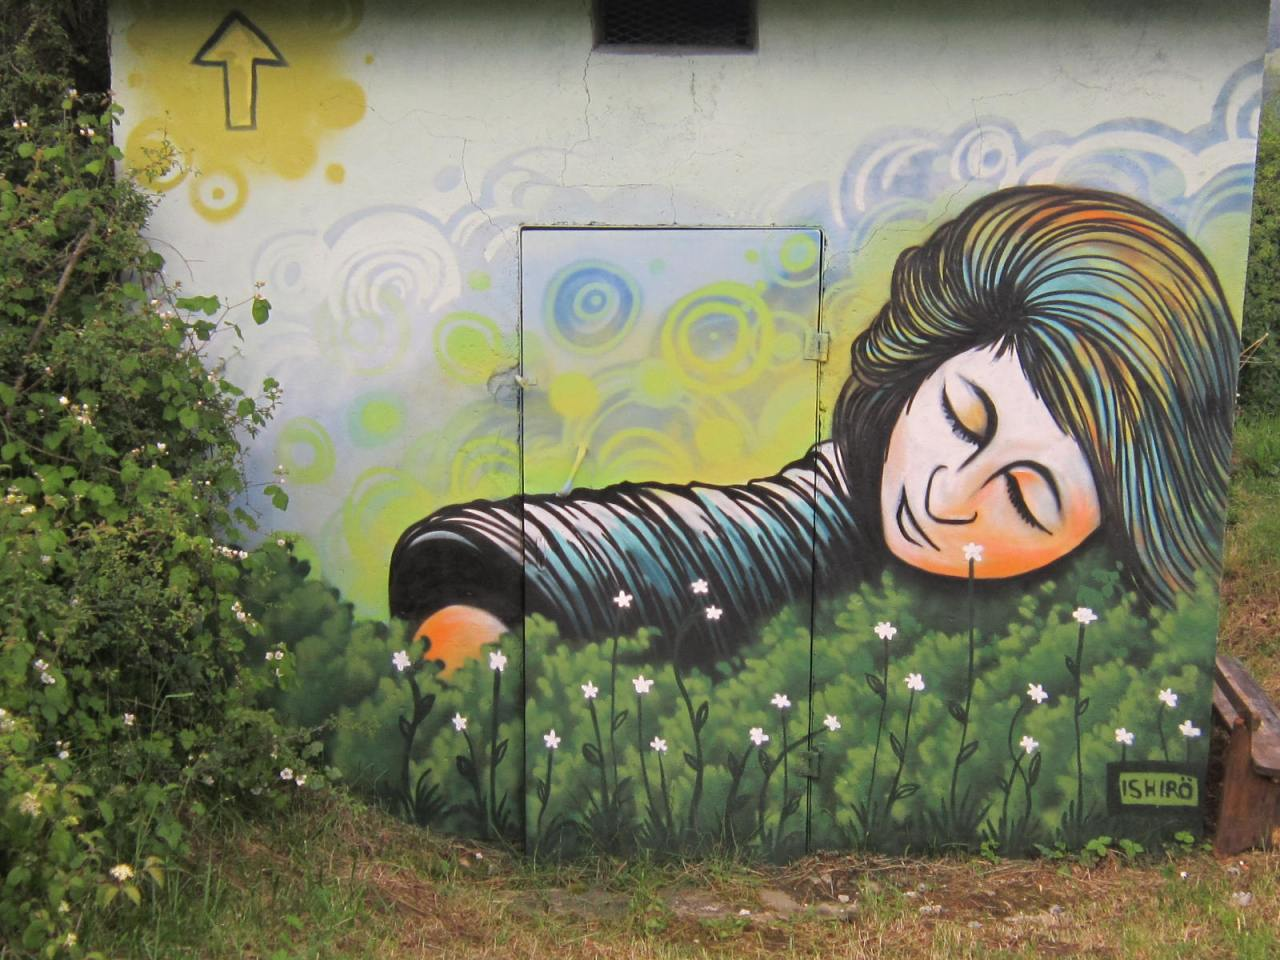 Camino art on the way between Zubiri and Pamplona (Camino Frances/FrenchWay)